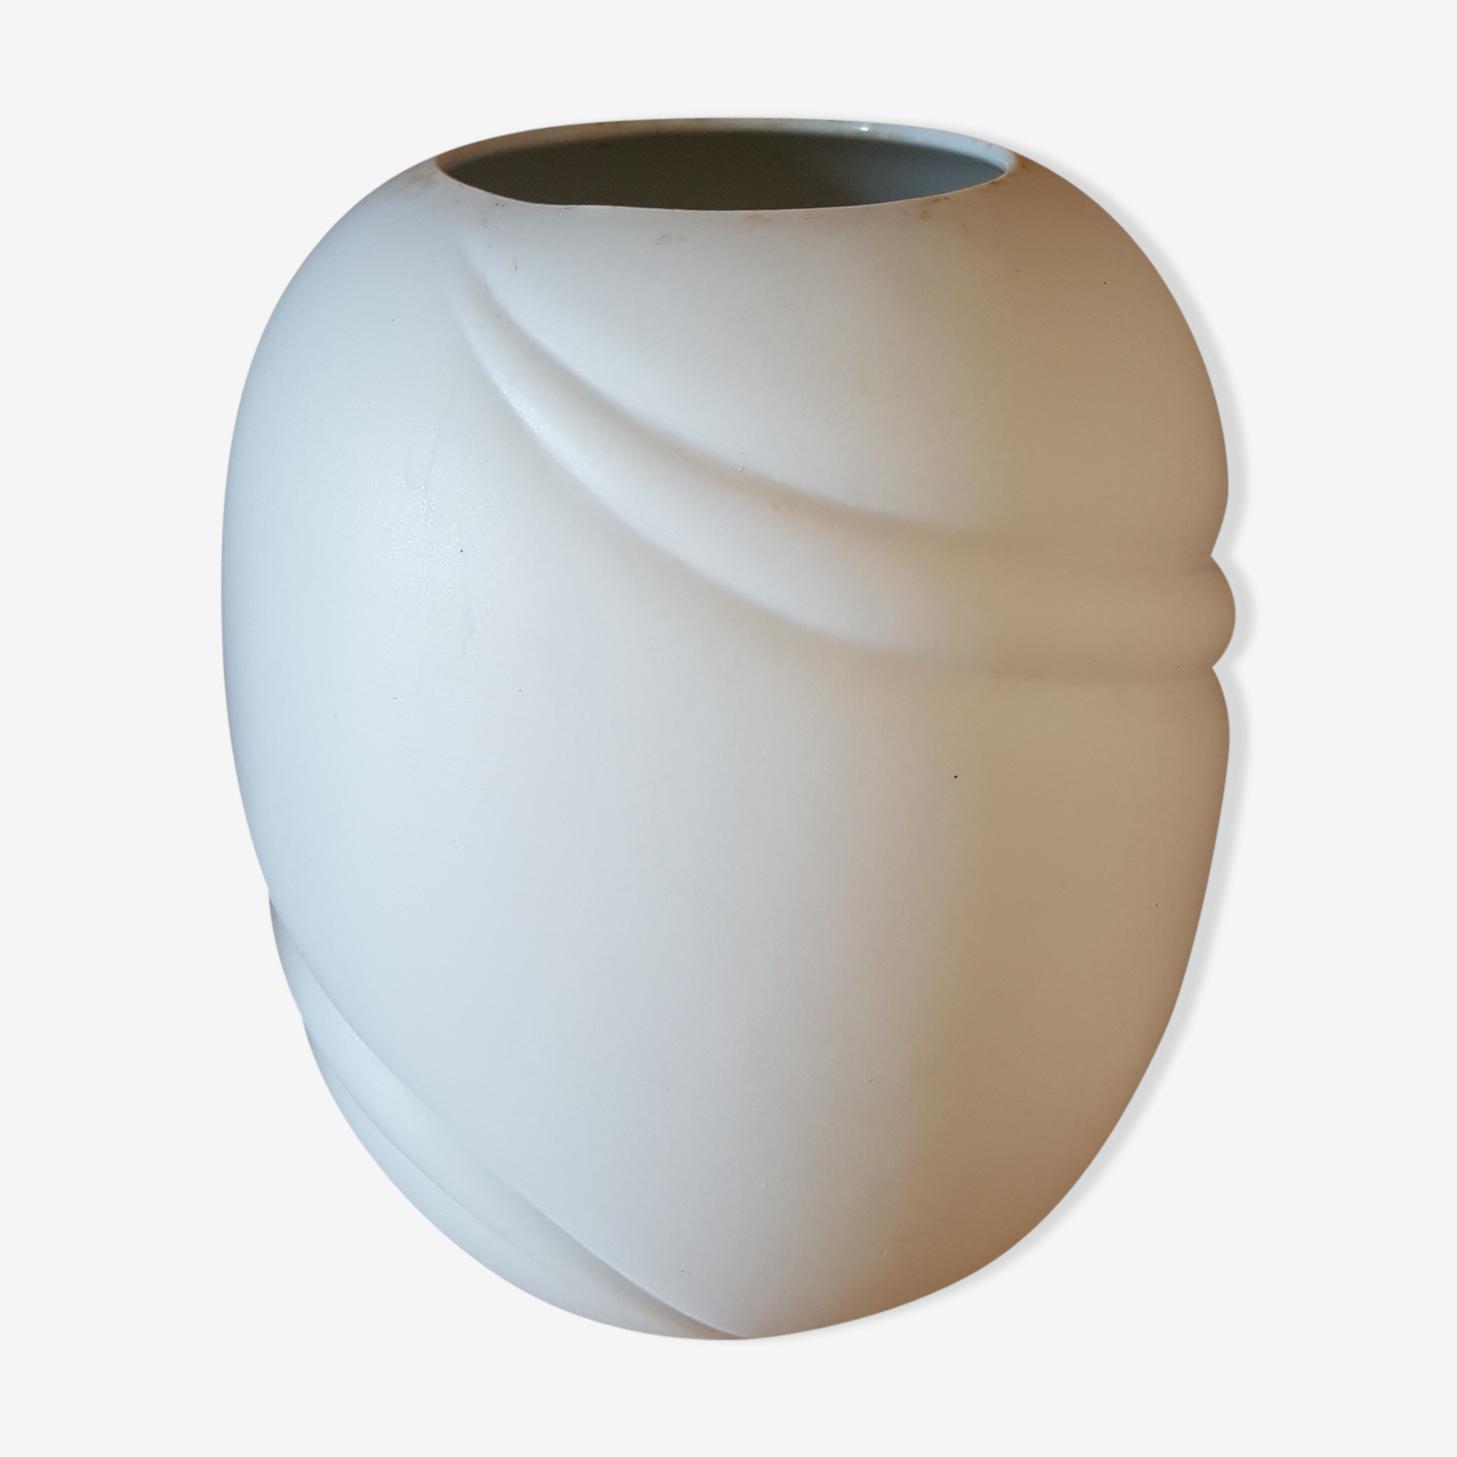 Royal KPM Bavaria matte white porcelain vase